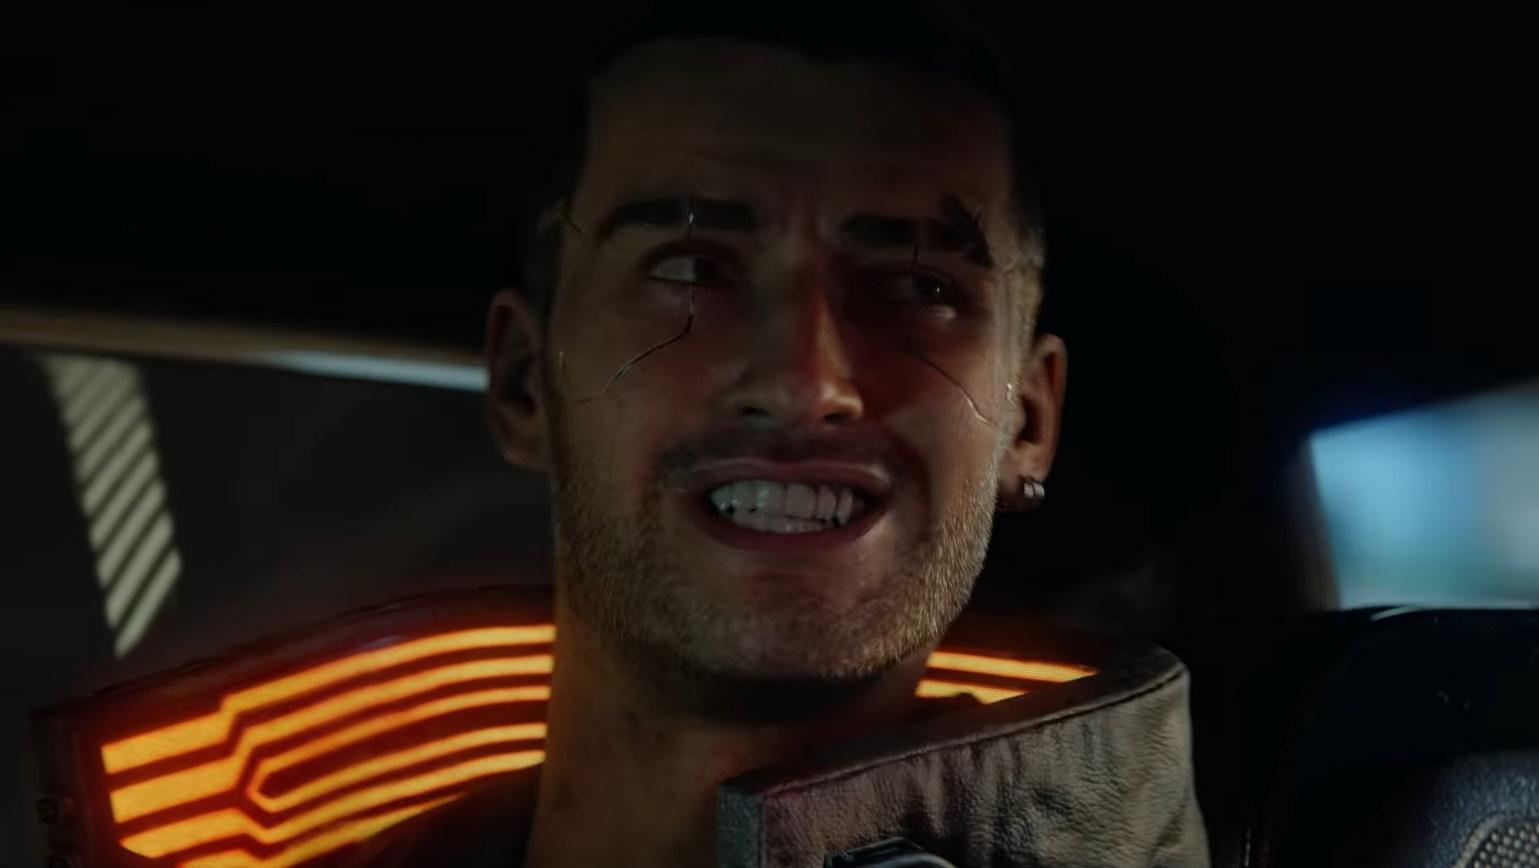 You can finish Cyberpunk 2077 without killing anyone | PC Gamer